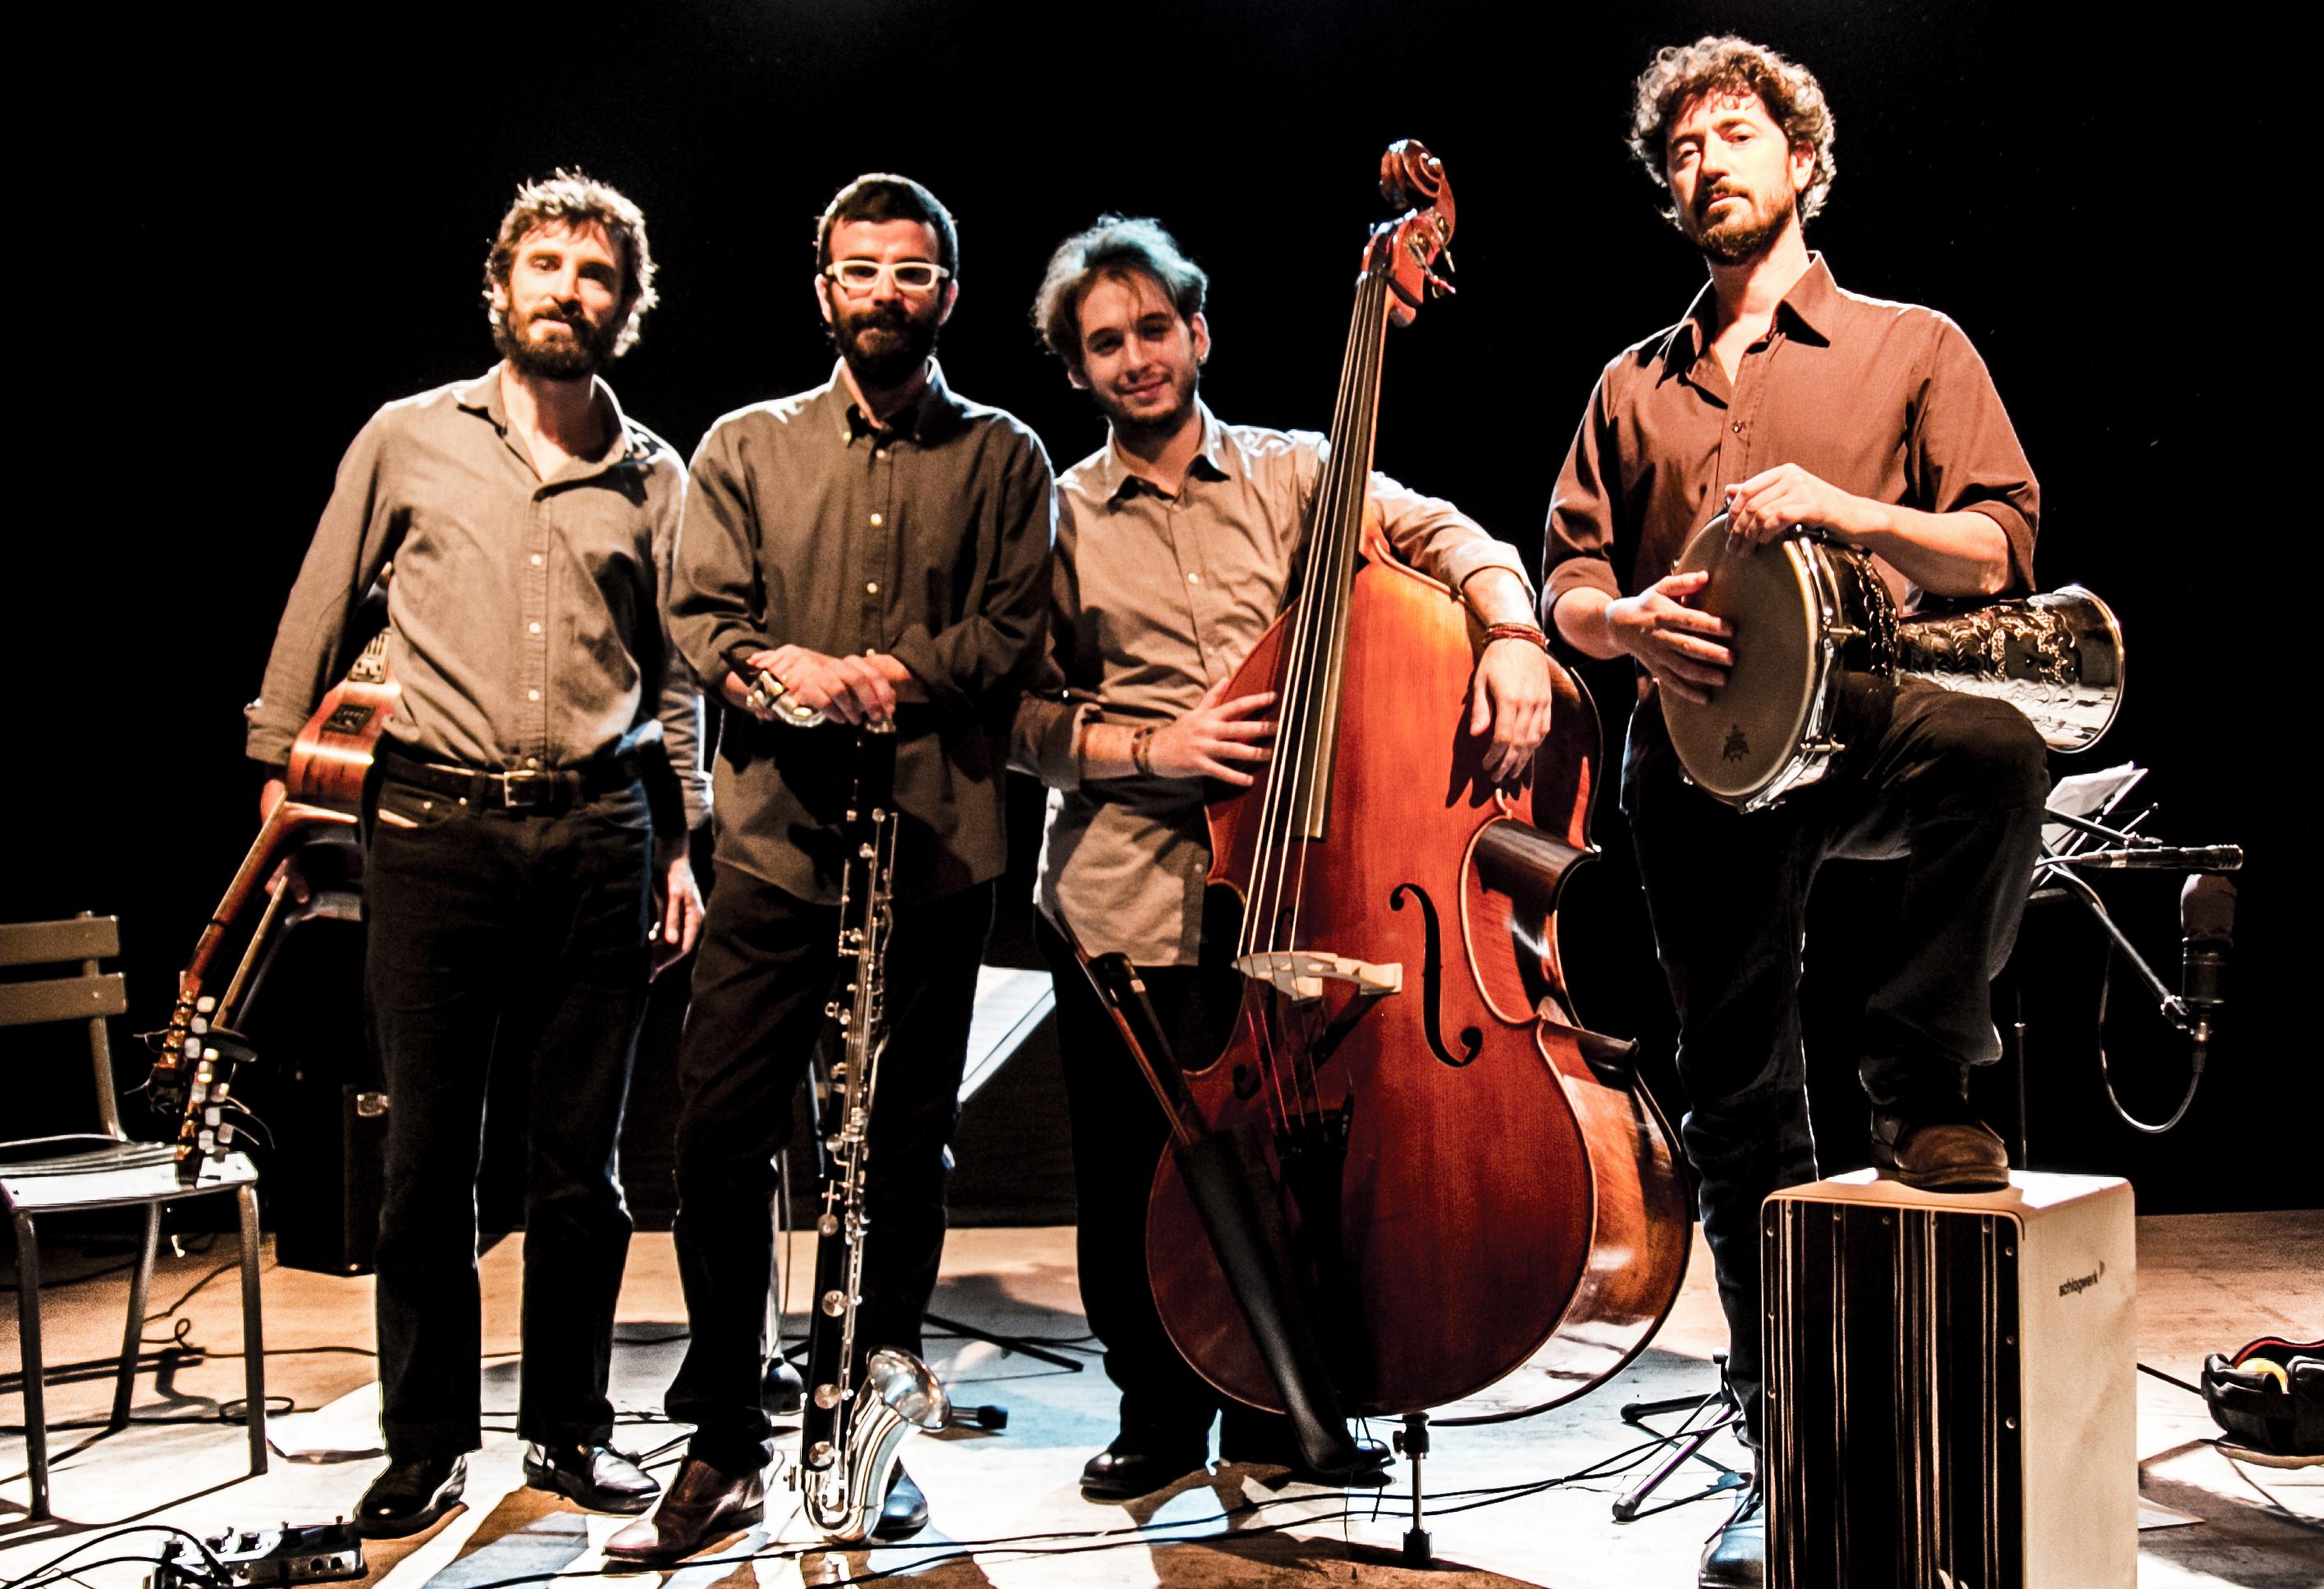 OttoMani. Mediterranean Jazz. photo by Gloria Chillotti